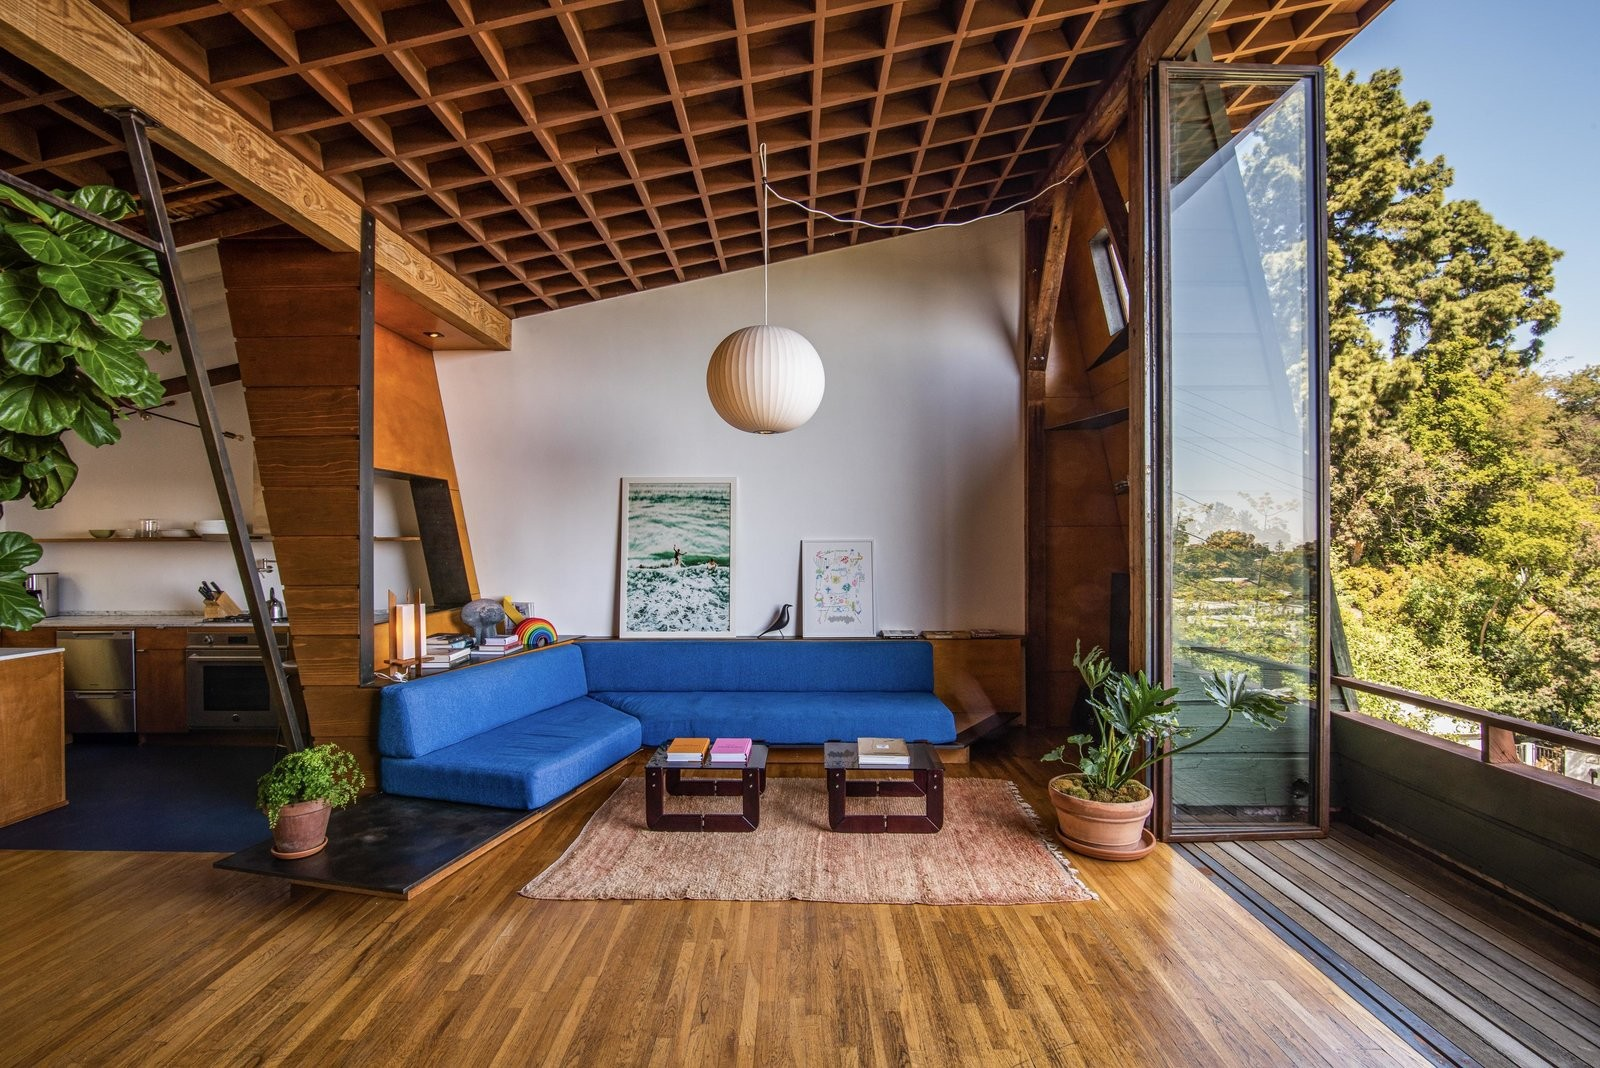 Laurel Canyon Home by Quincy Jones & Ruth Schneider, California, USA